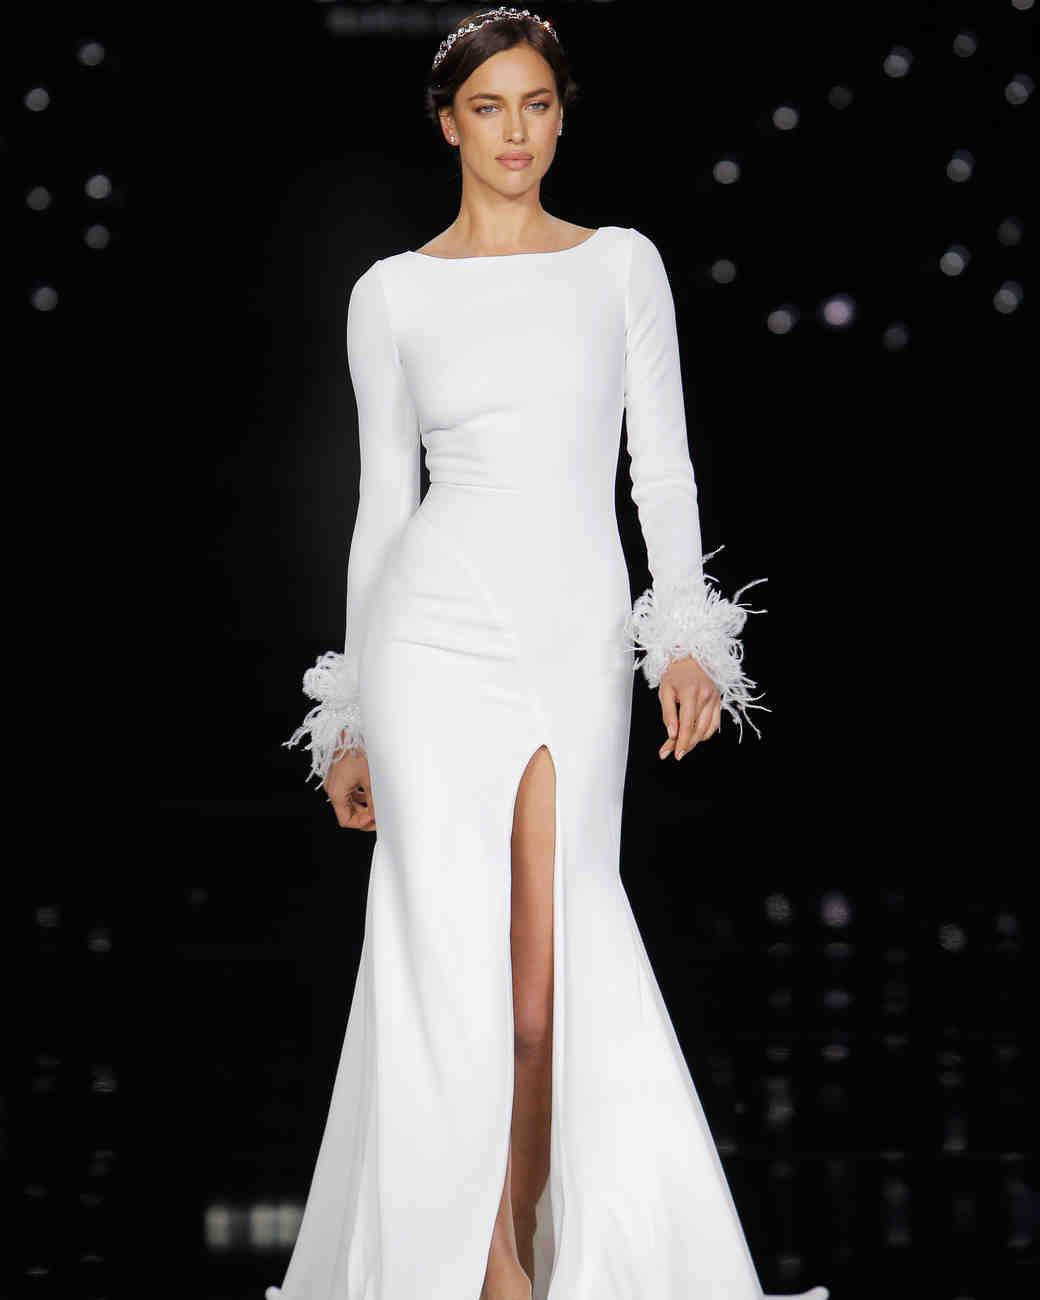 Simple Pronovias Wedding Dress with thigh high Slit